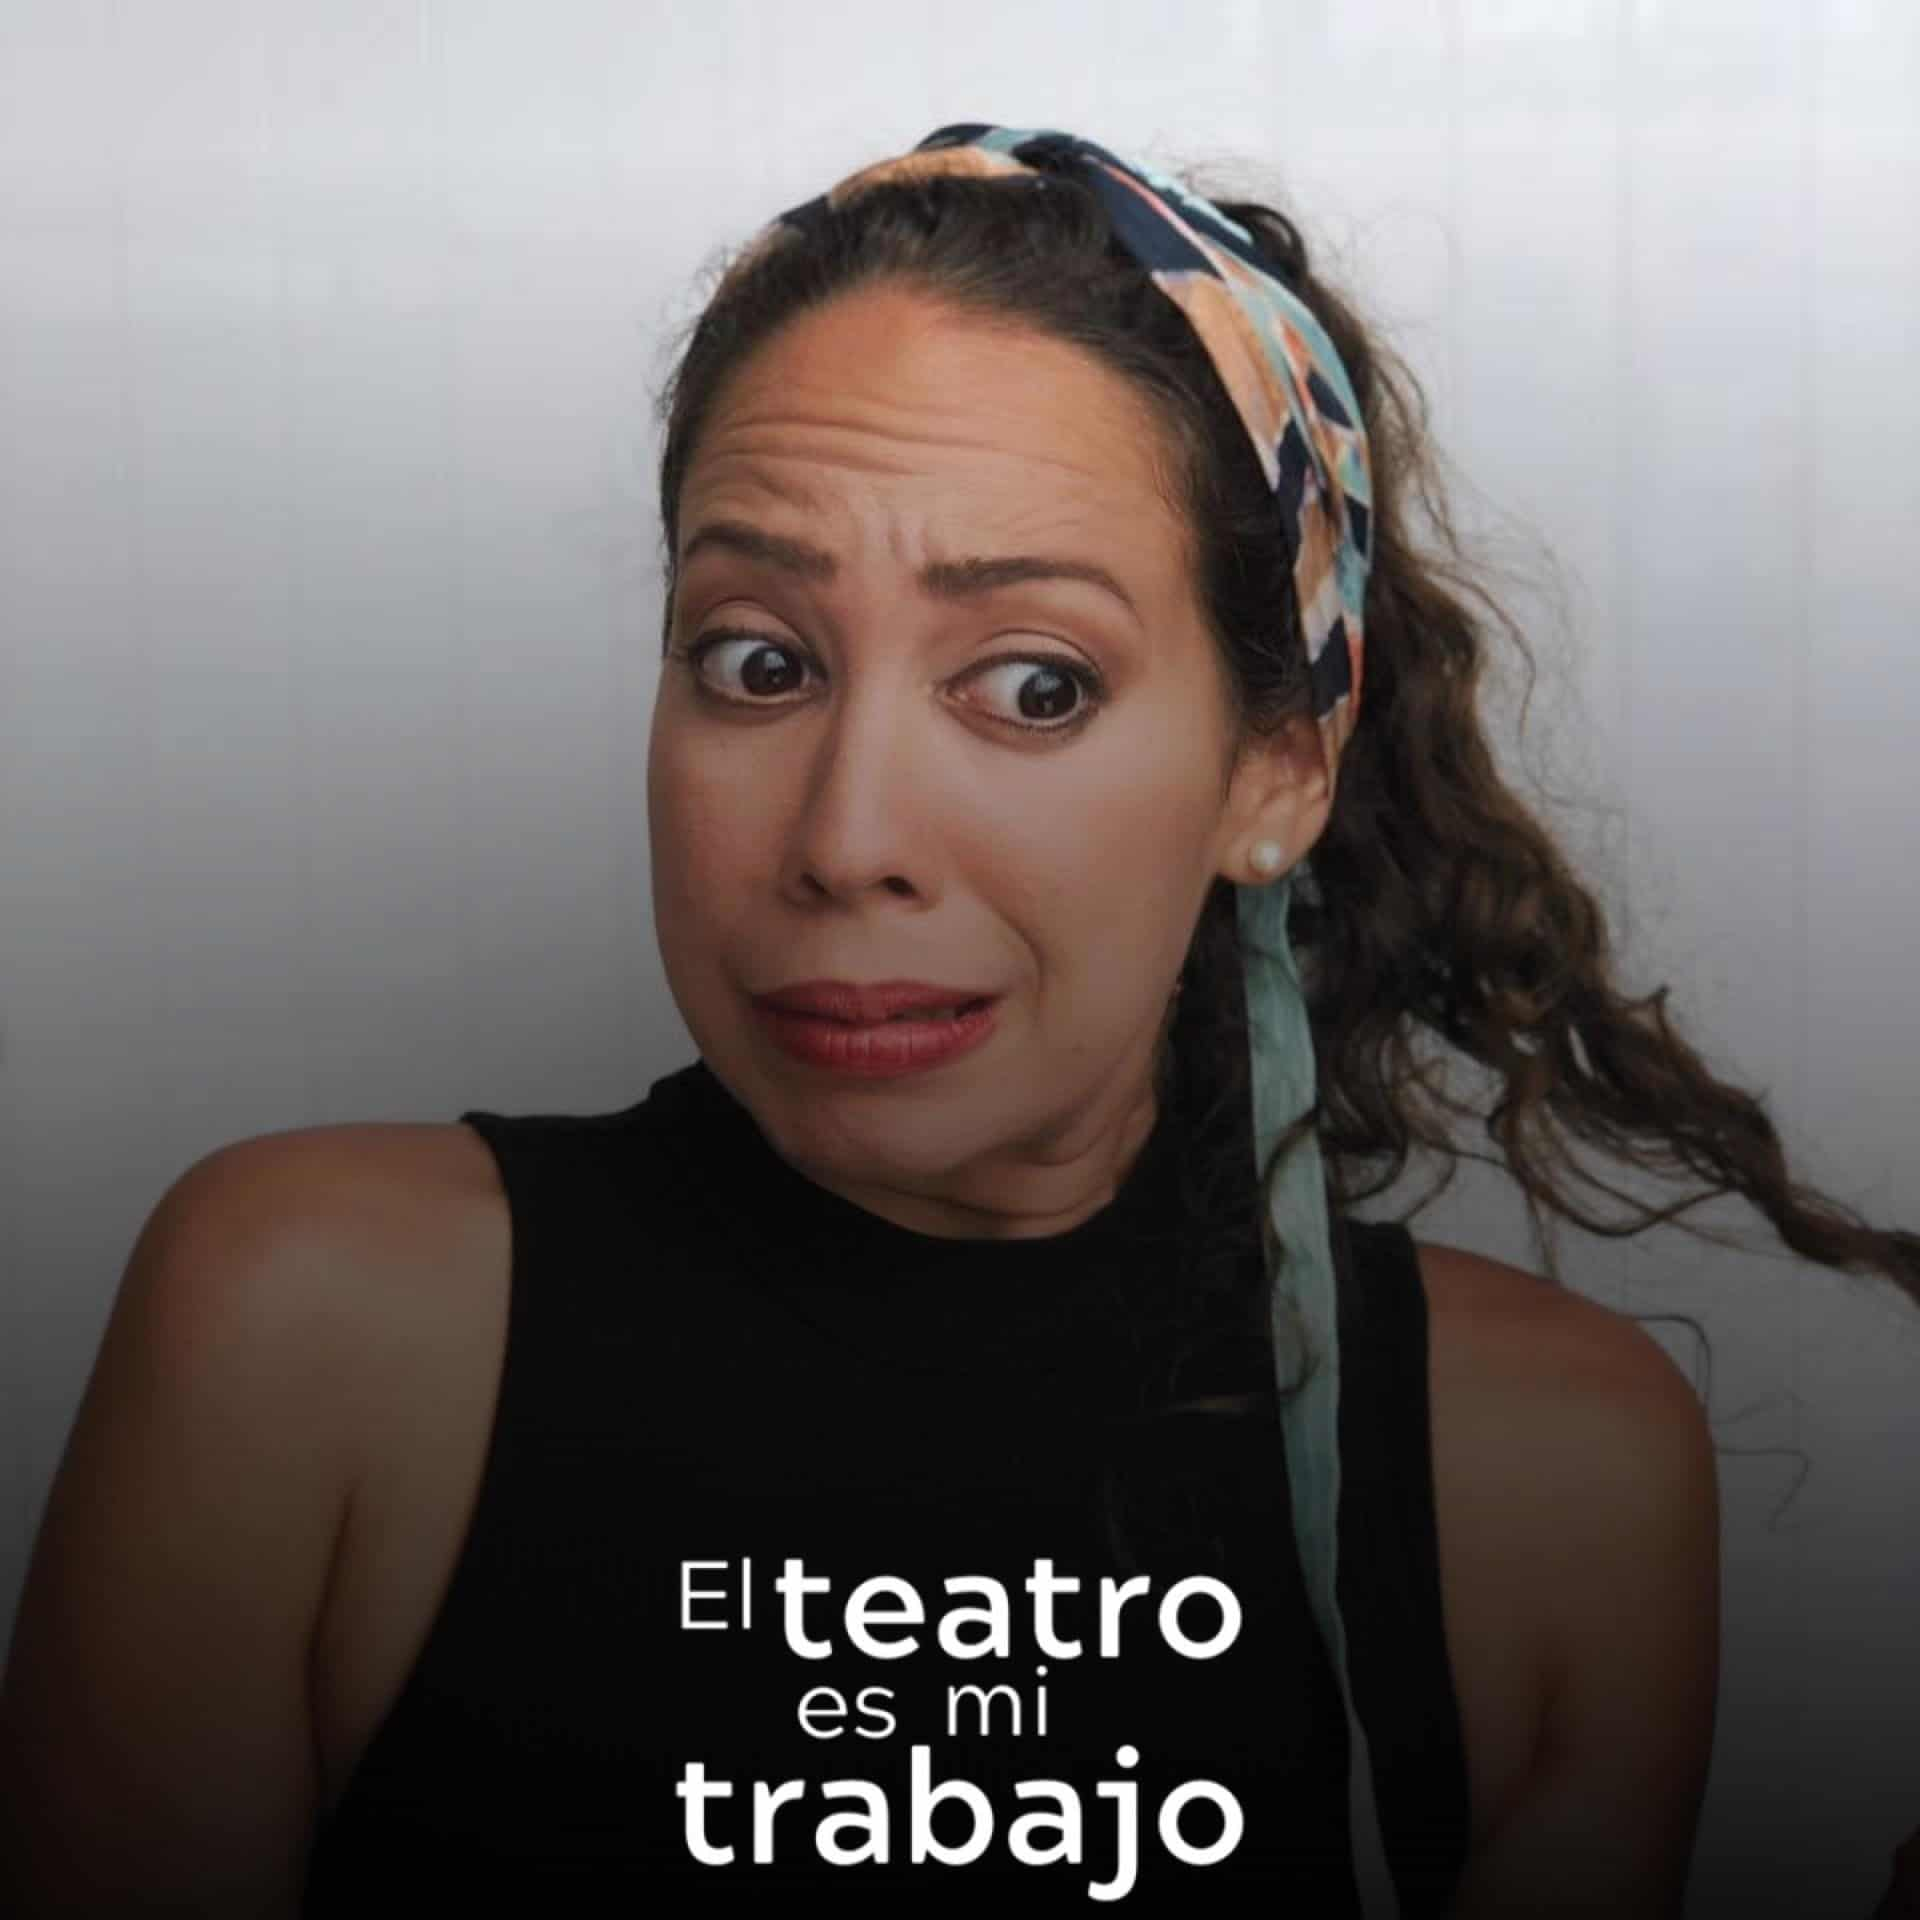 Festival de teatro en casa